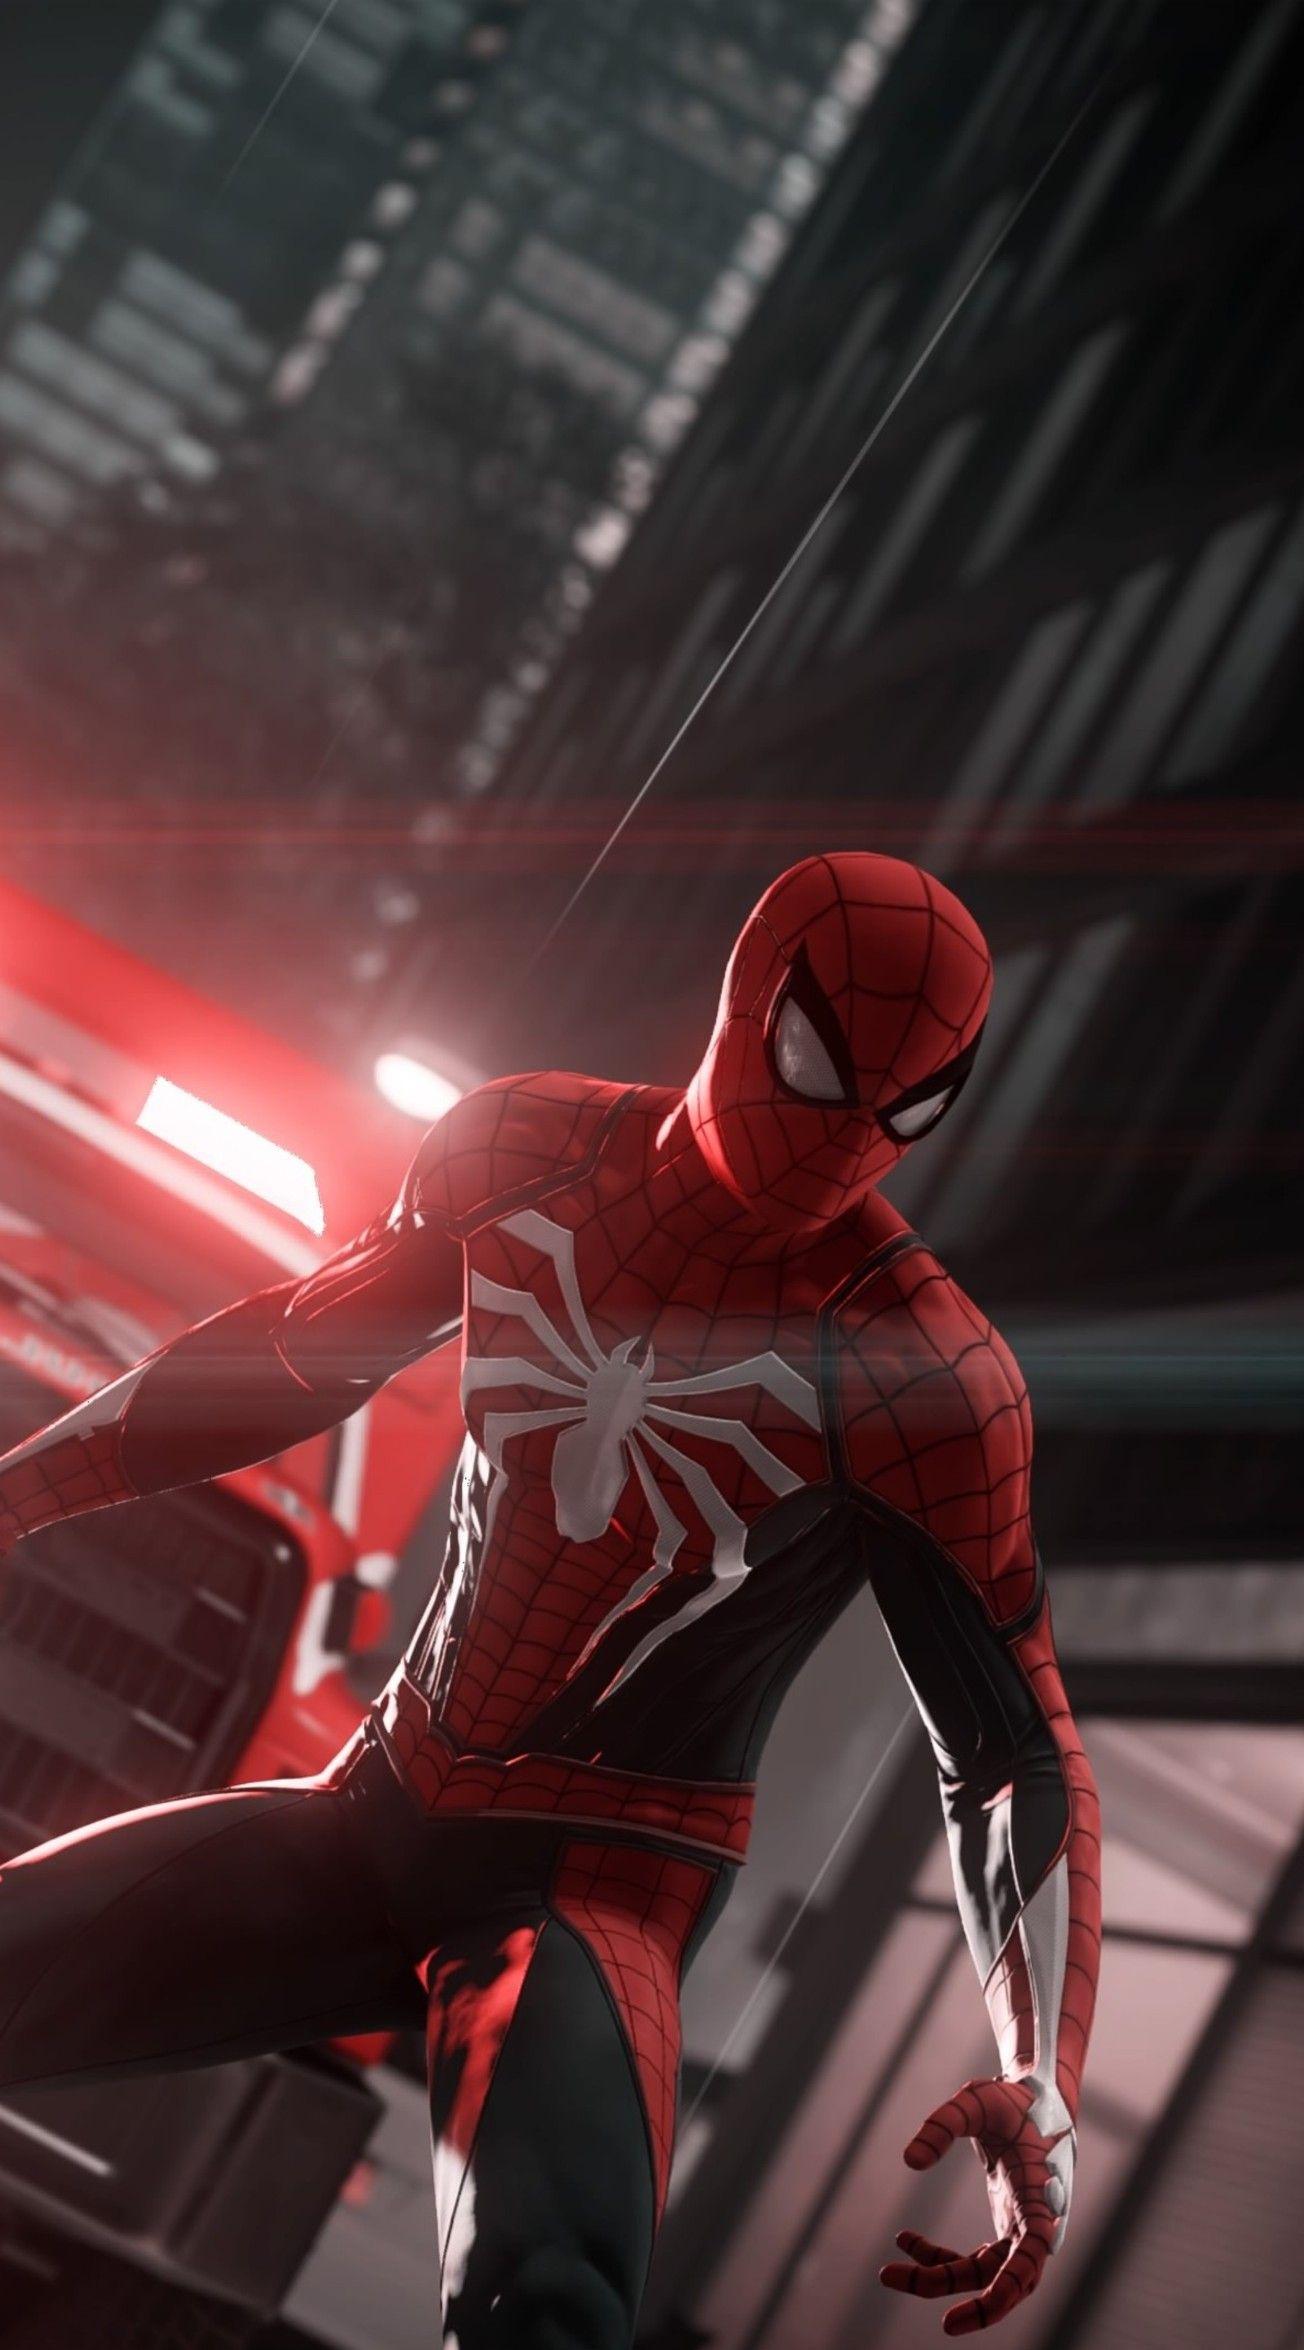 Spider Man Ps4 Spiderman Ps4 Magnificos Spiderman Personajes